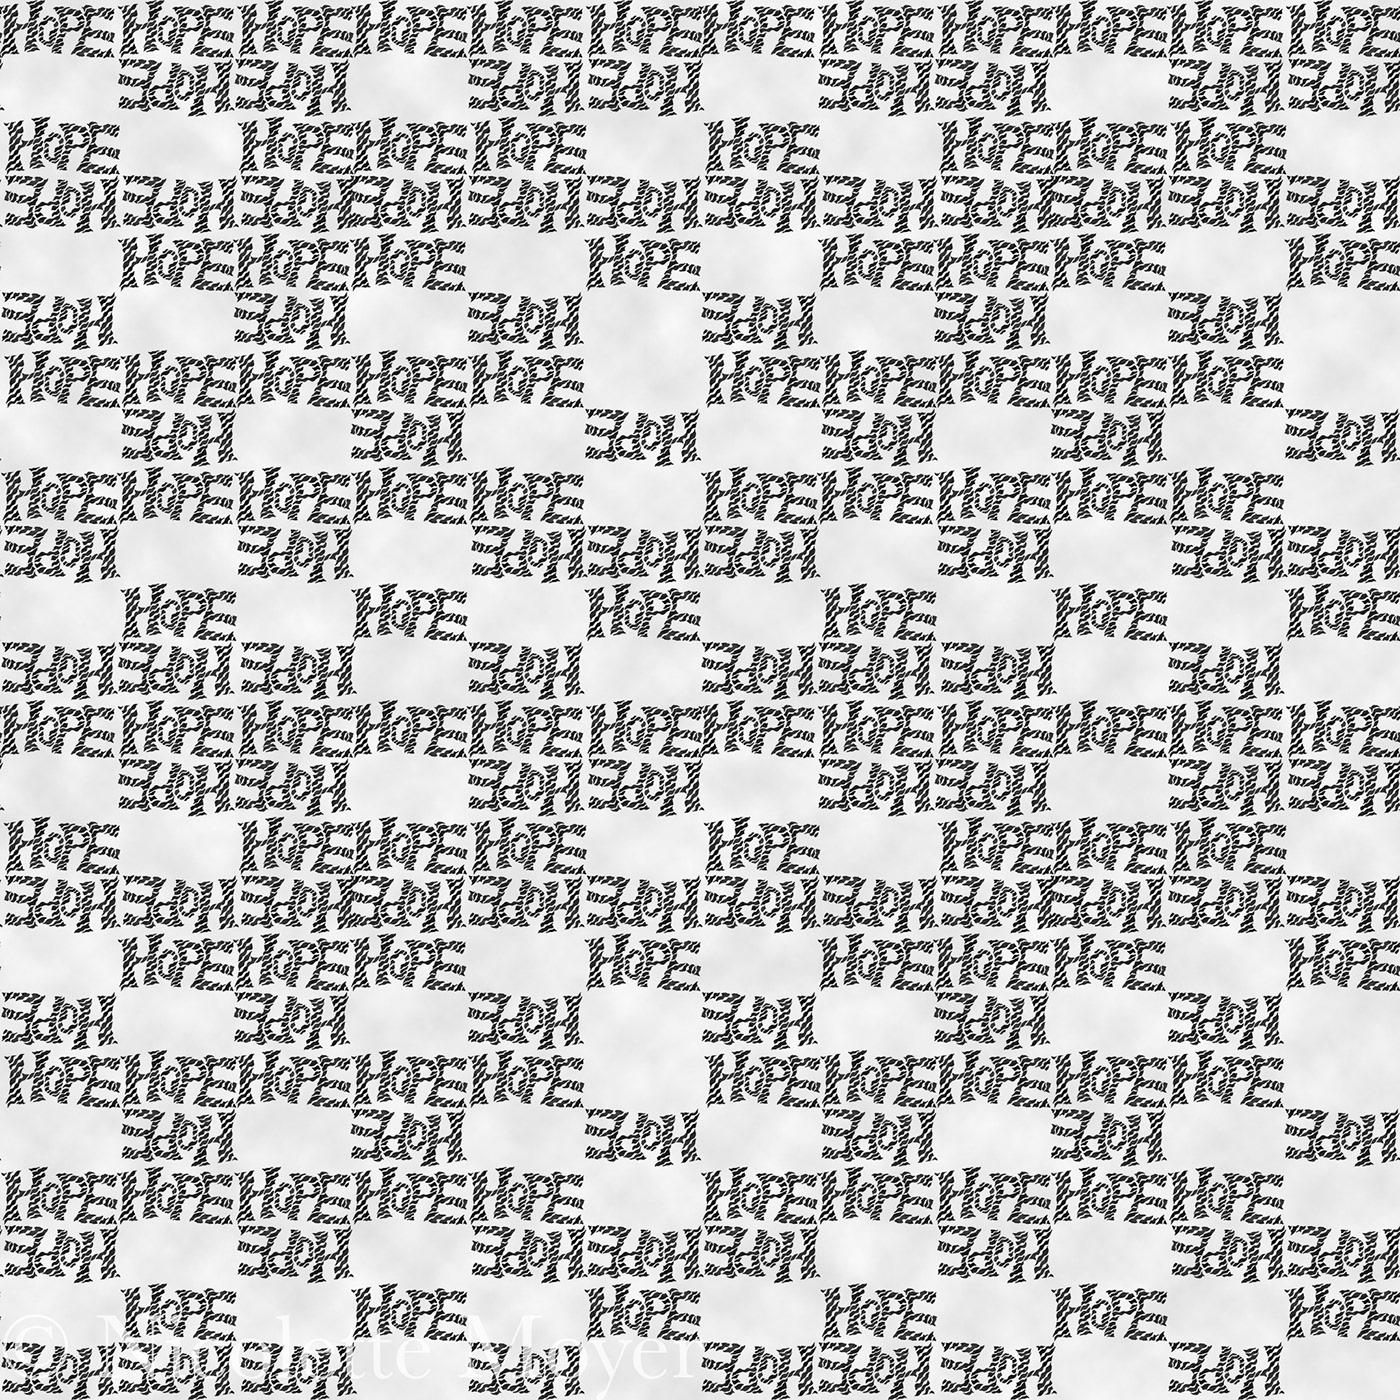 art design Digital Art  fine art graphic design  pattern textile Textiles